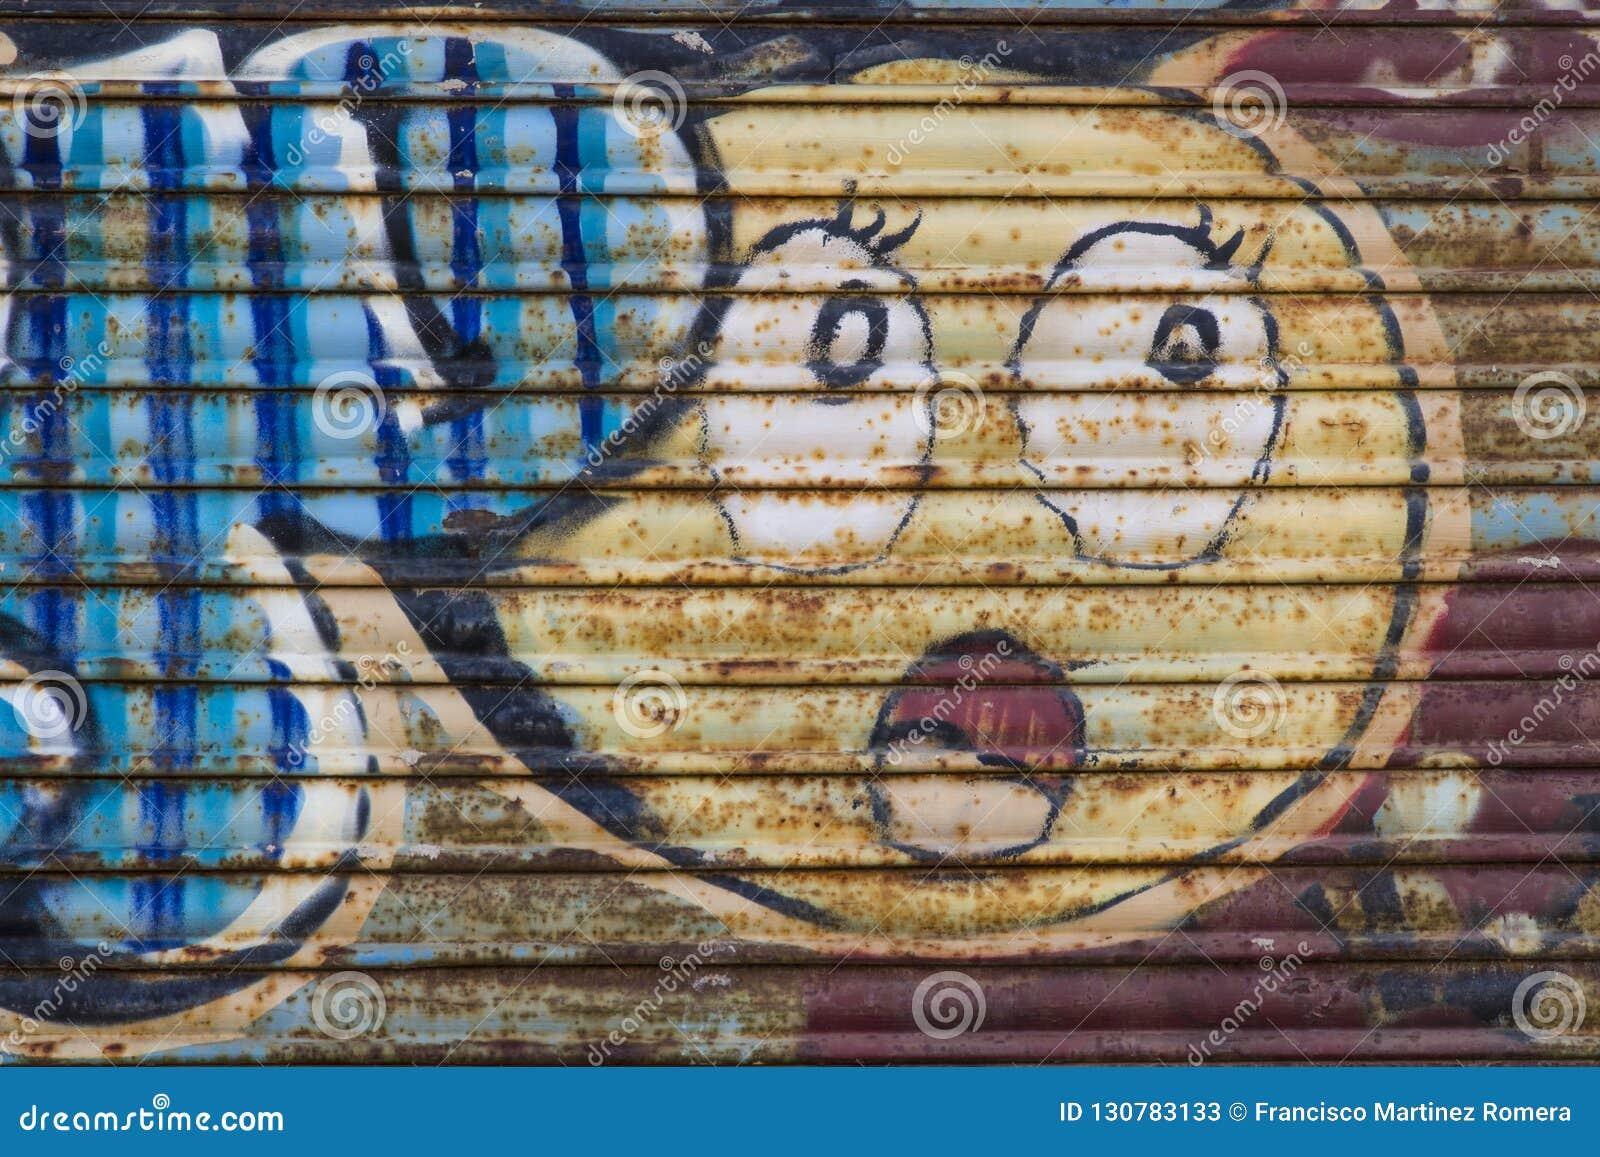 Spray painted graffiti on metal blind